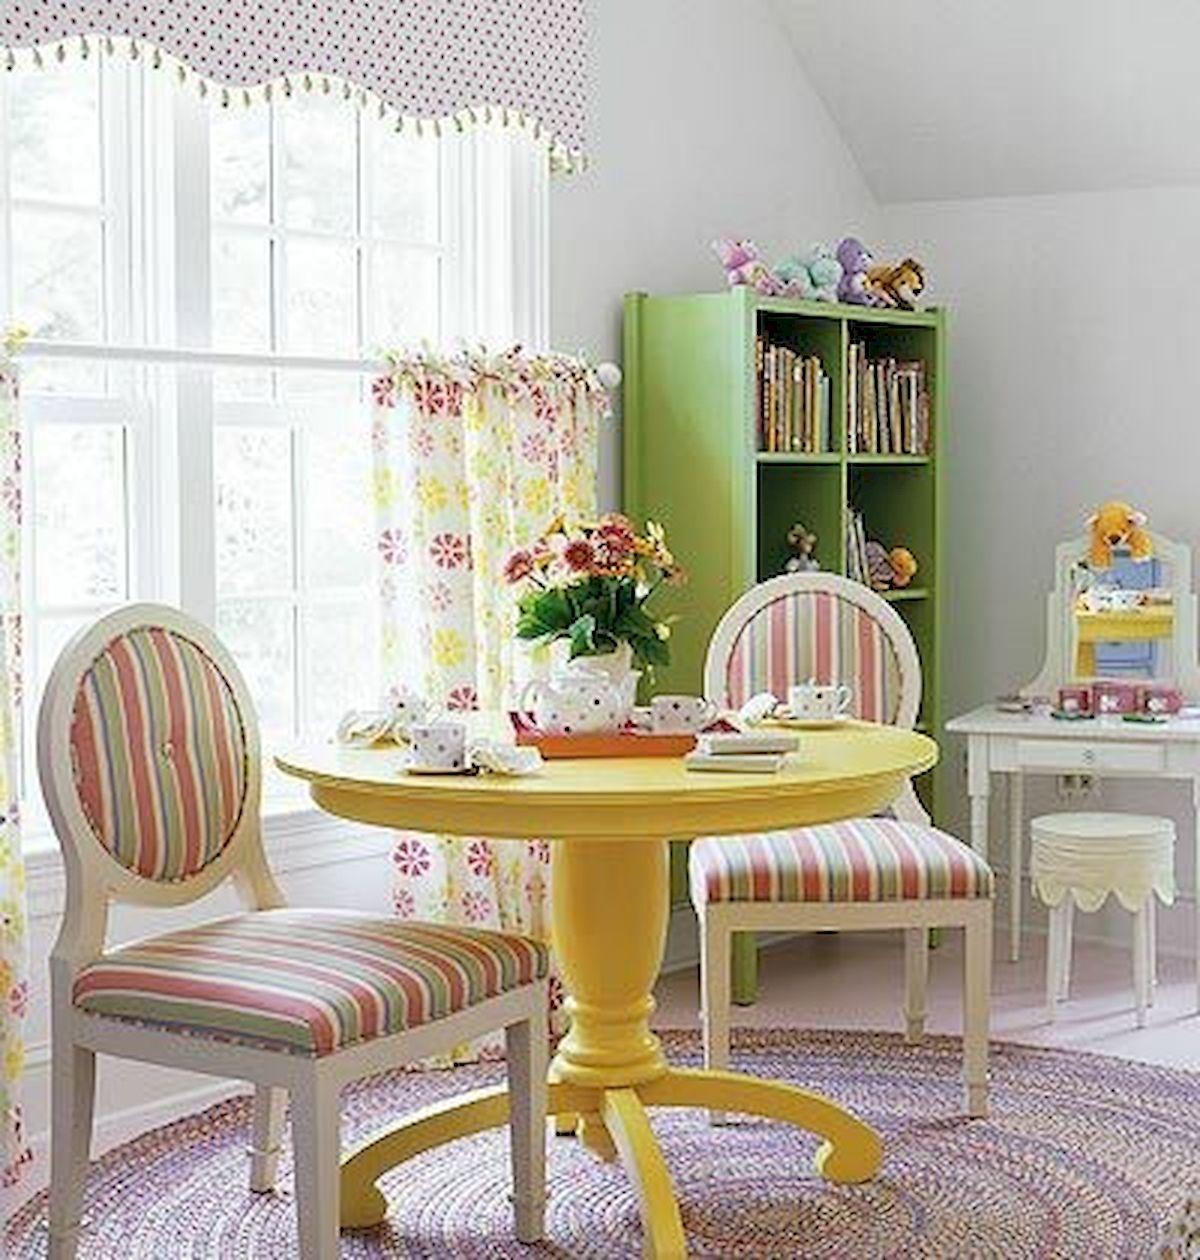 45 Colorful Interior Home Design and Decor Ideas (21)